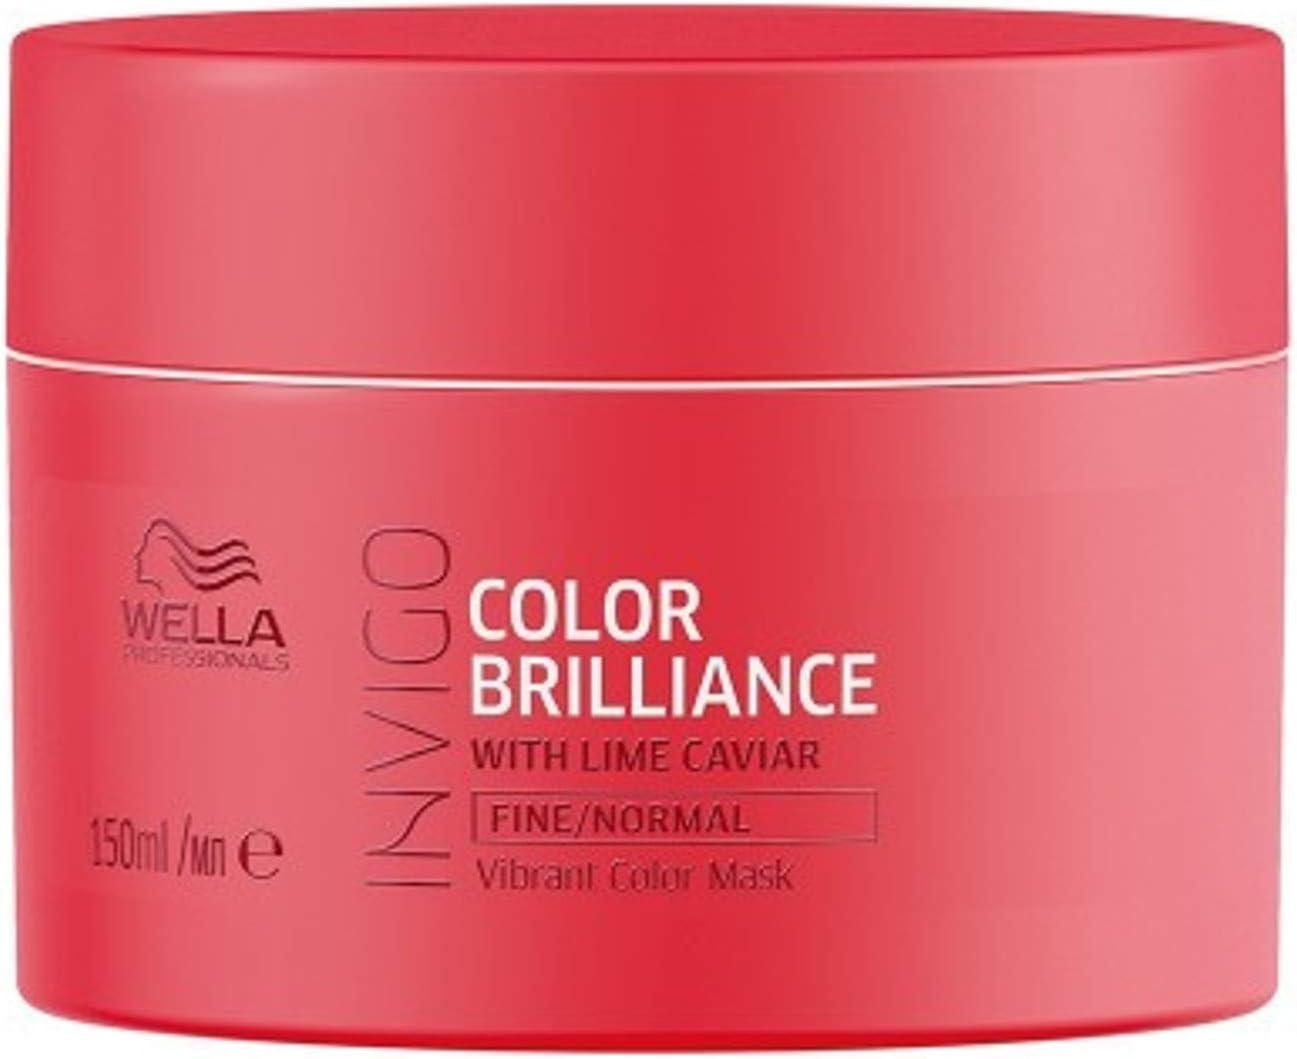 Wella INVIGO Color Brilliance Mask Fine mascarilla para el pelo Unisex 150 ml - Mascarillas para el cabello (Unisex, 150 ml, 1 pieza(s))